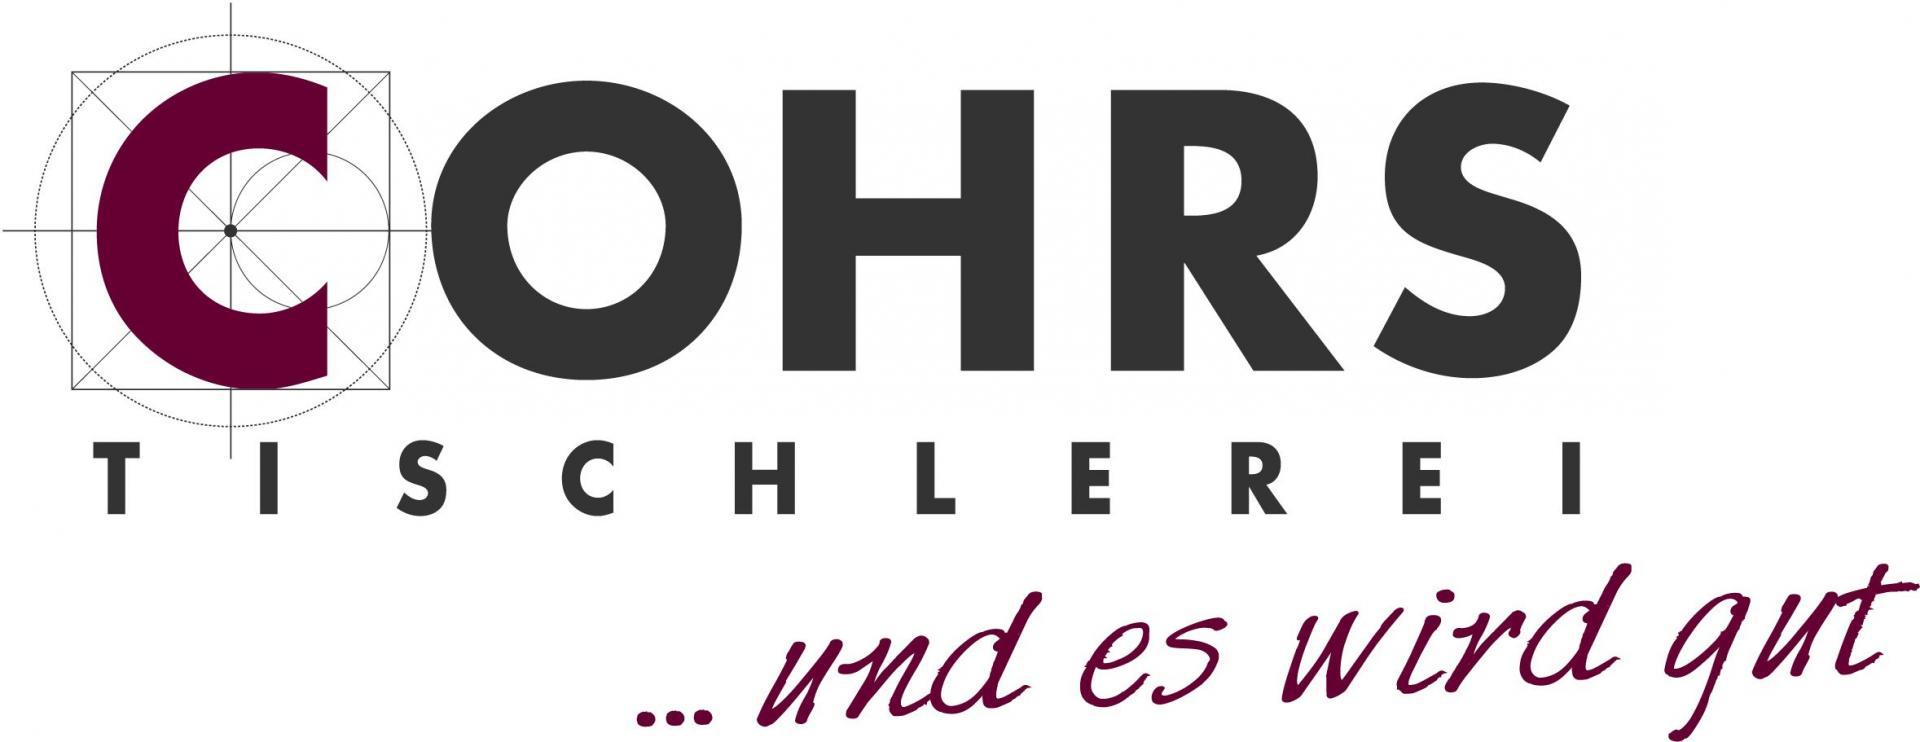 Tischlerei Cohrs